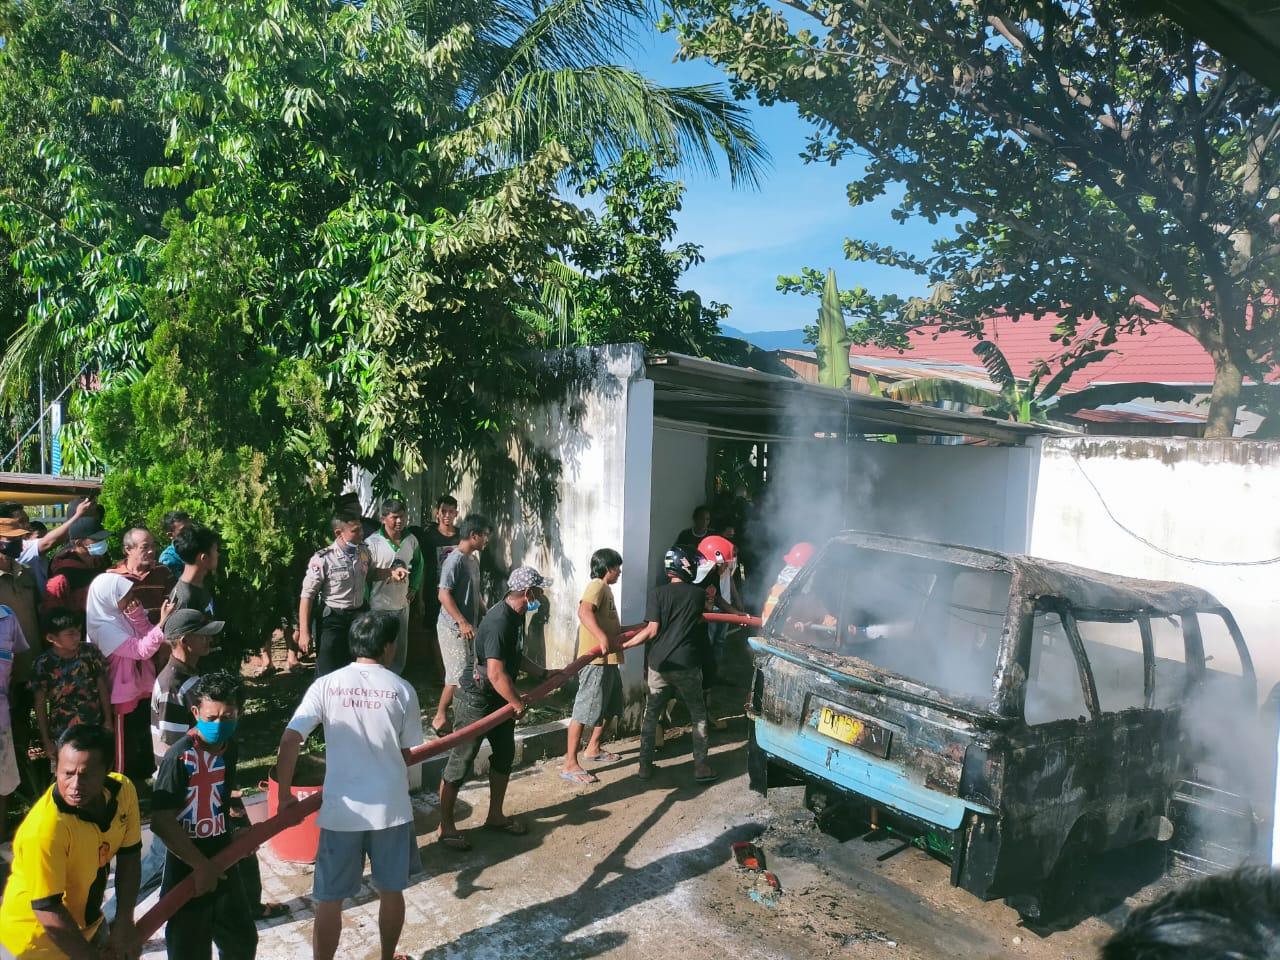 Polres Tolitoli Selidiki Penyebab Kebakaran Mobil dan Motor di SPBU Sandana